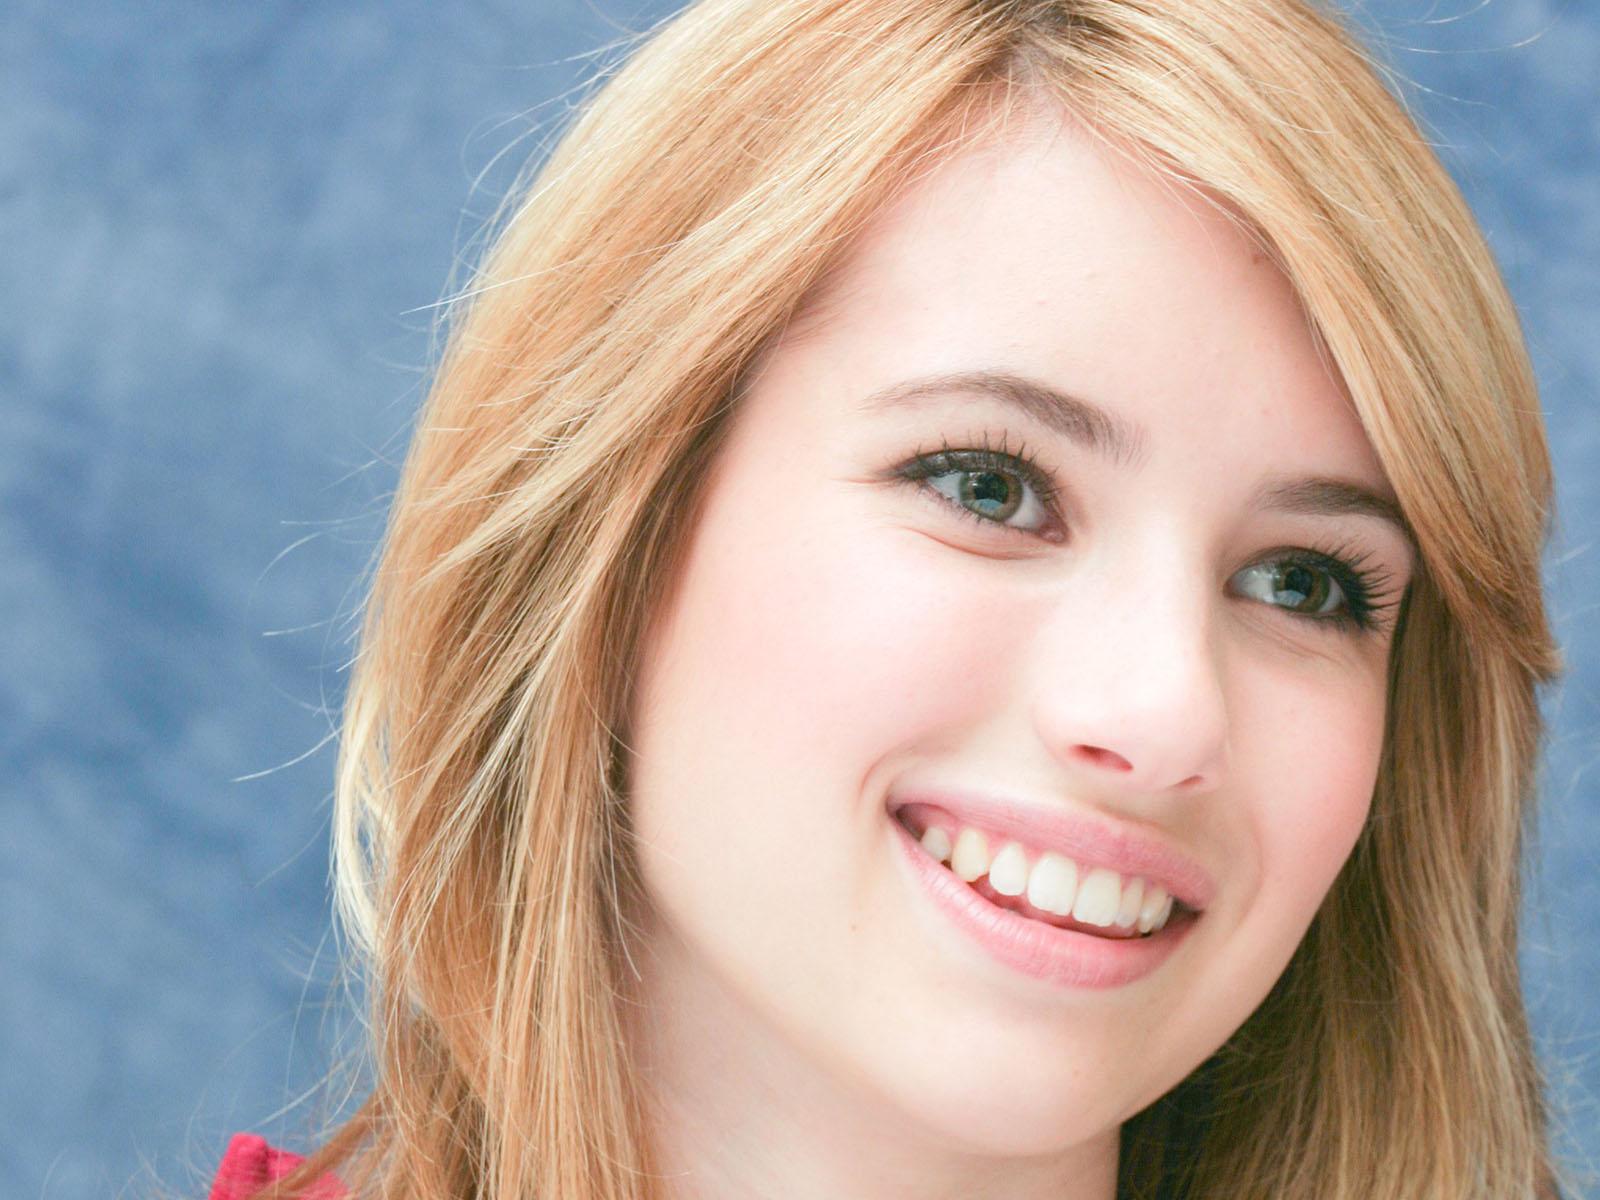 Emma_roberts_nettekeyifnet__1_jpg